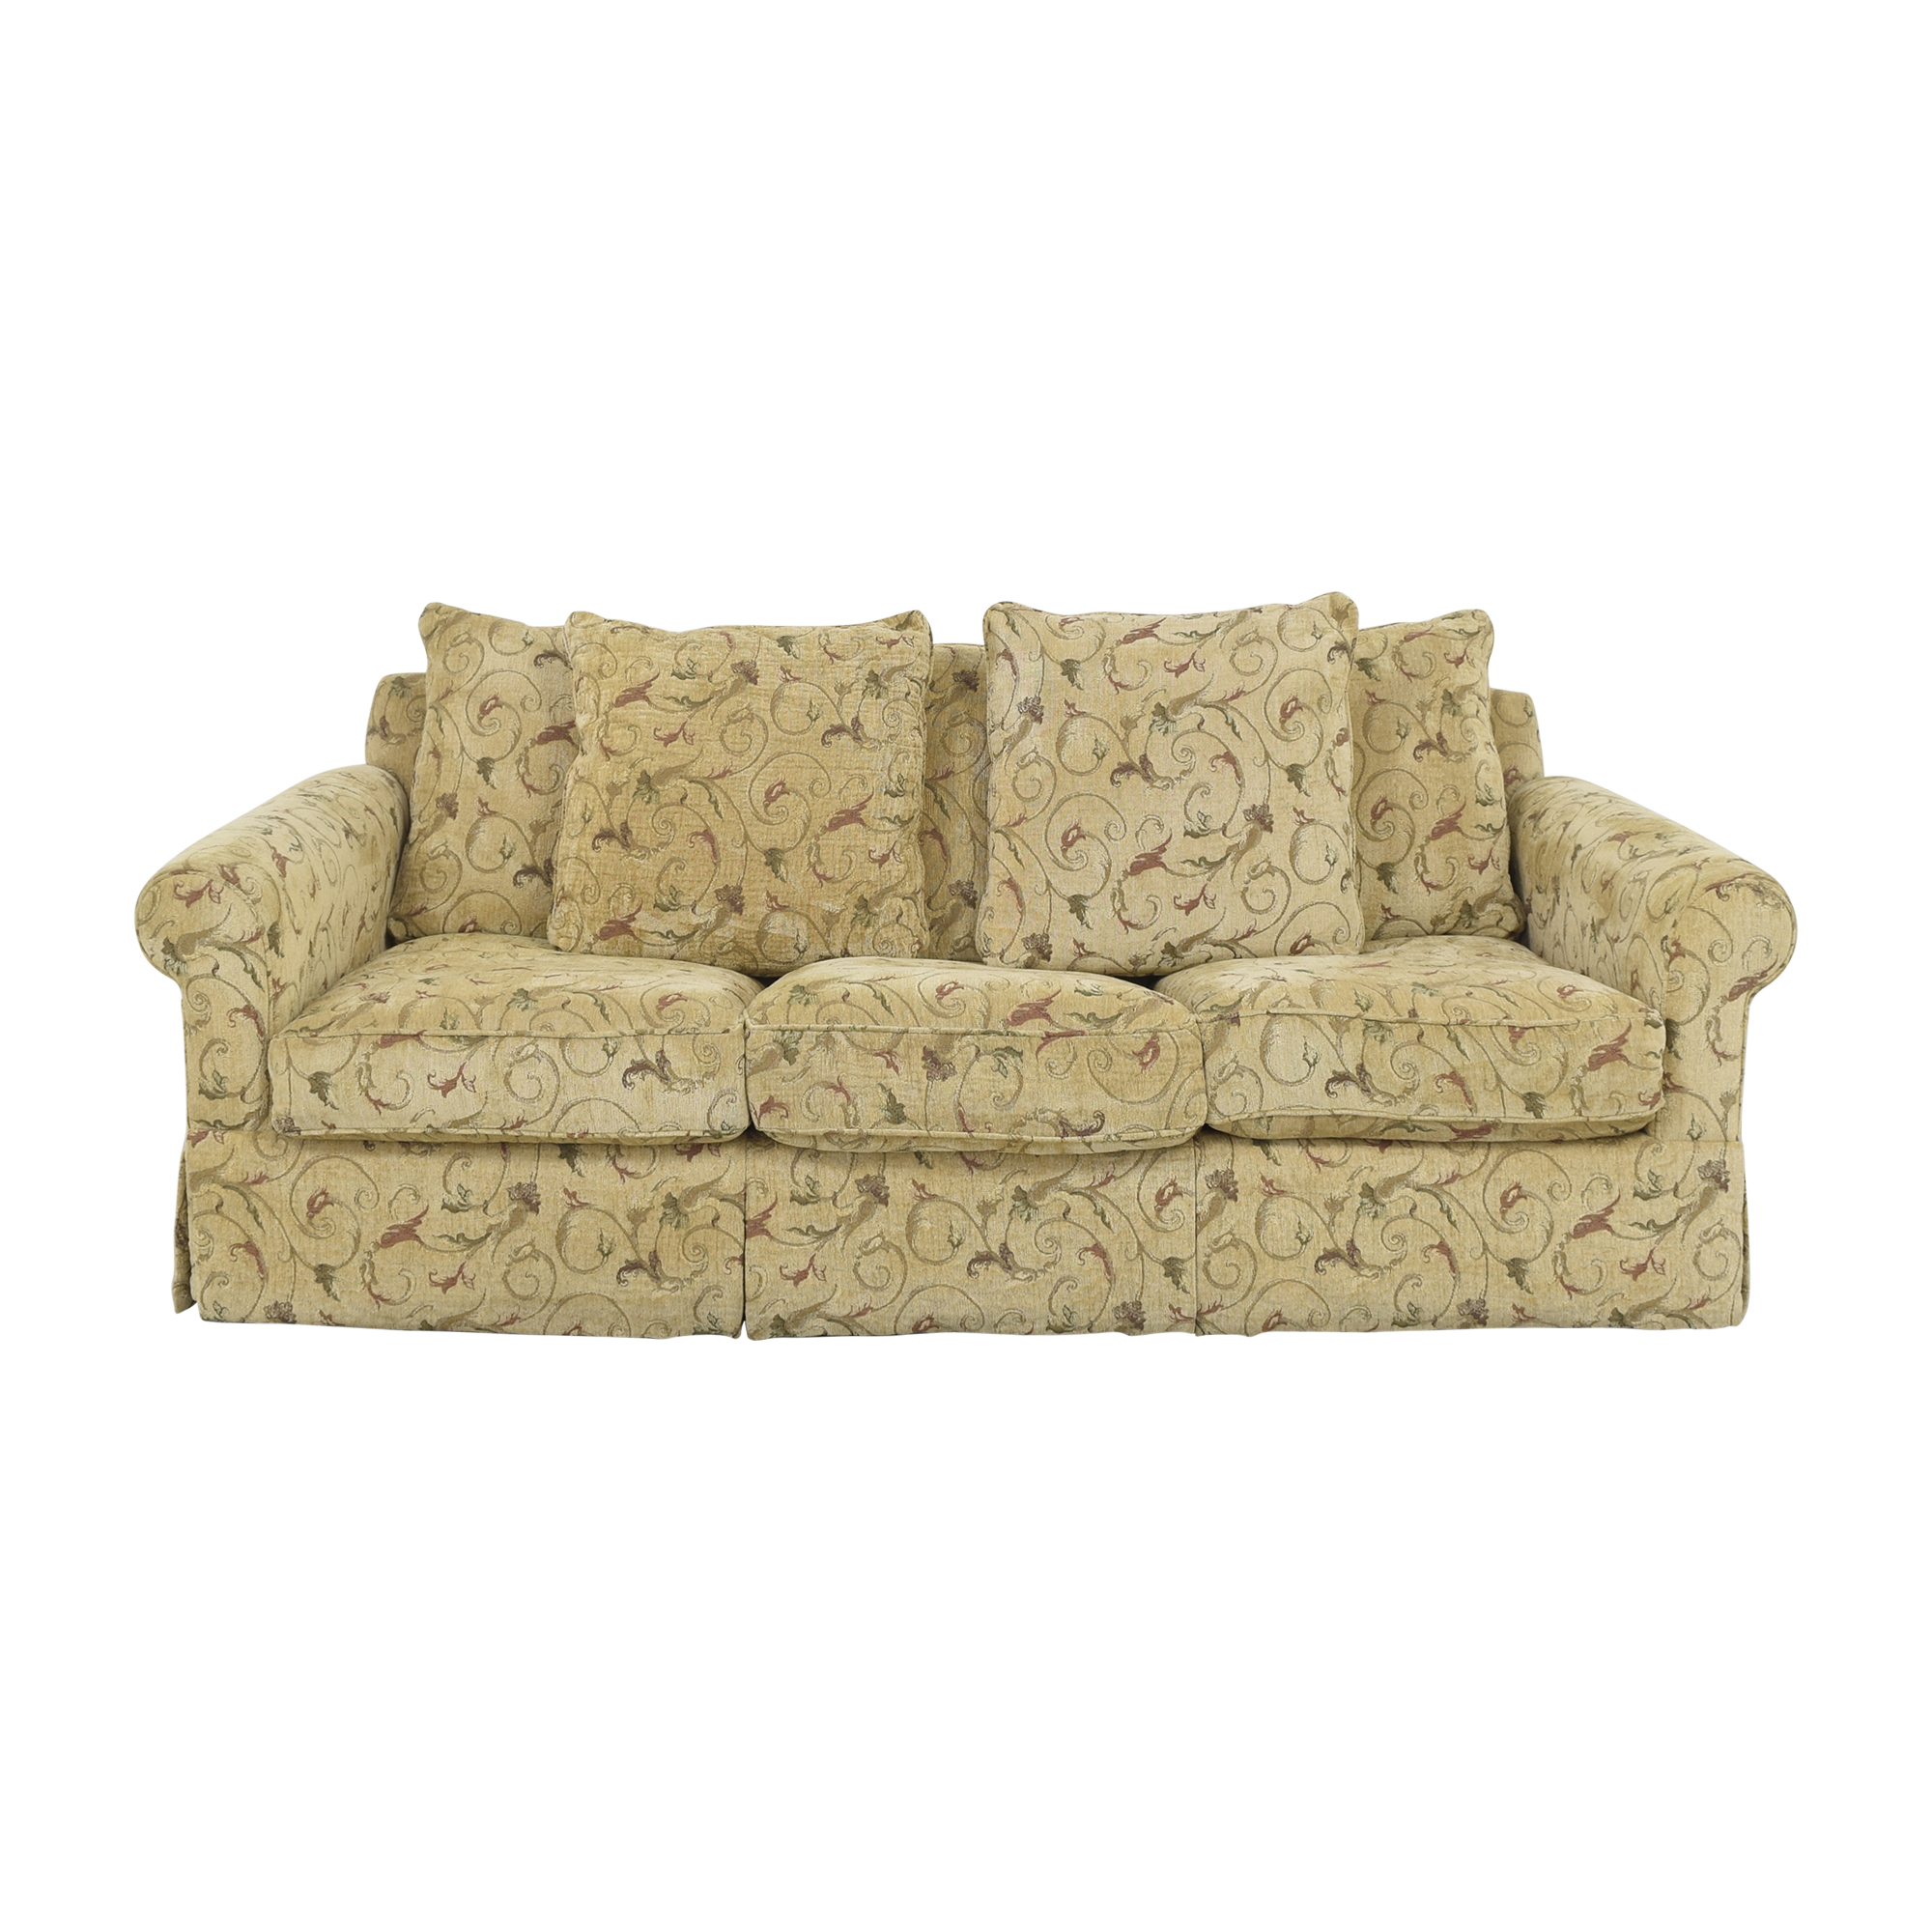 McCreary Modern McCreary Modern Sleeper Sofa ma